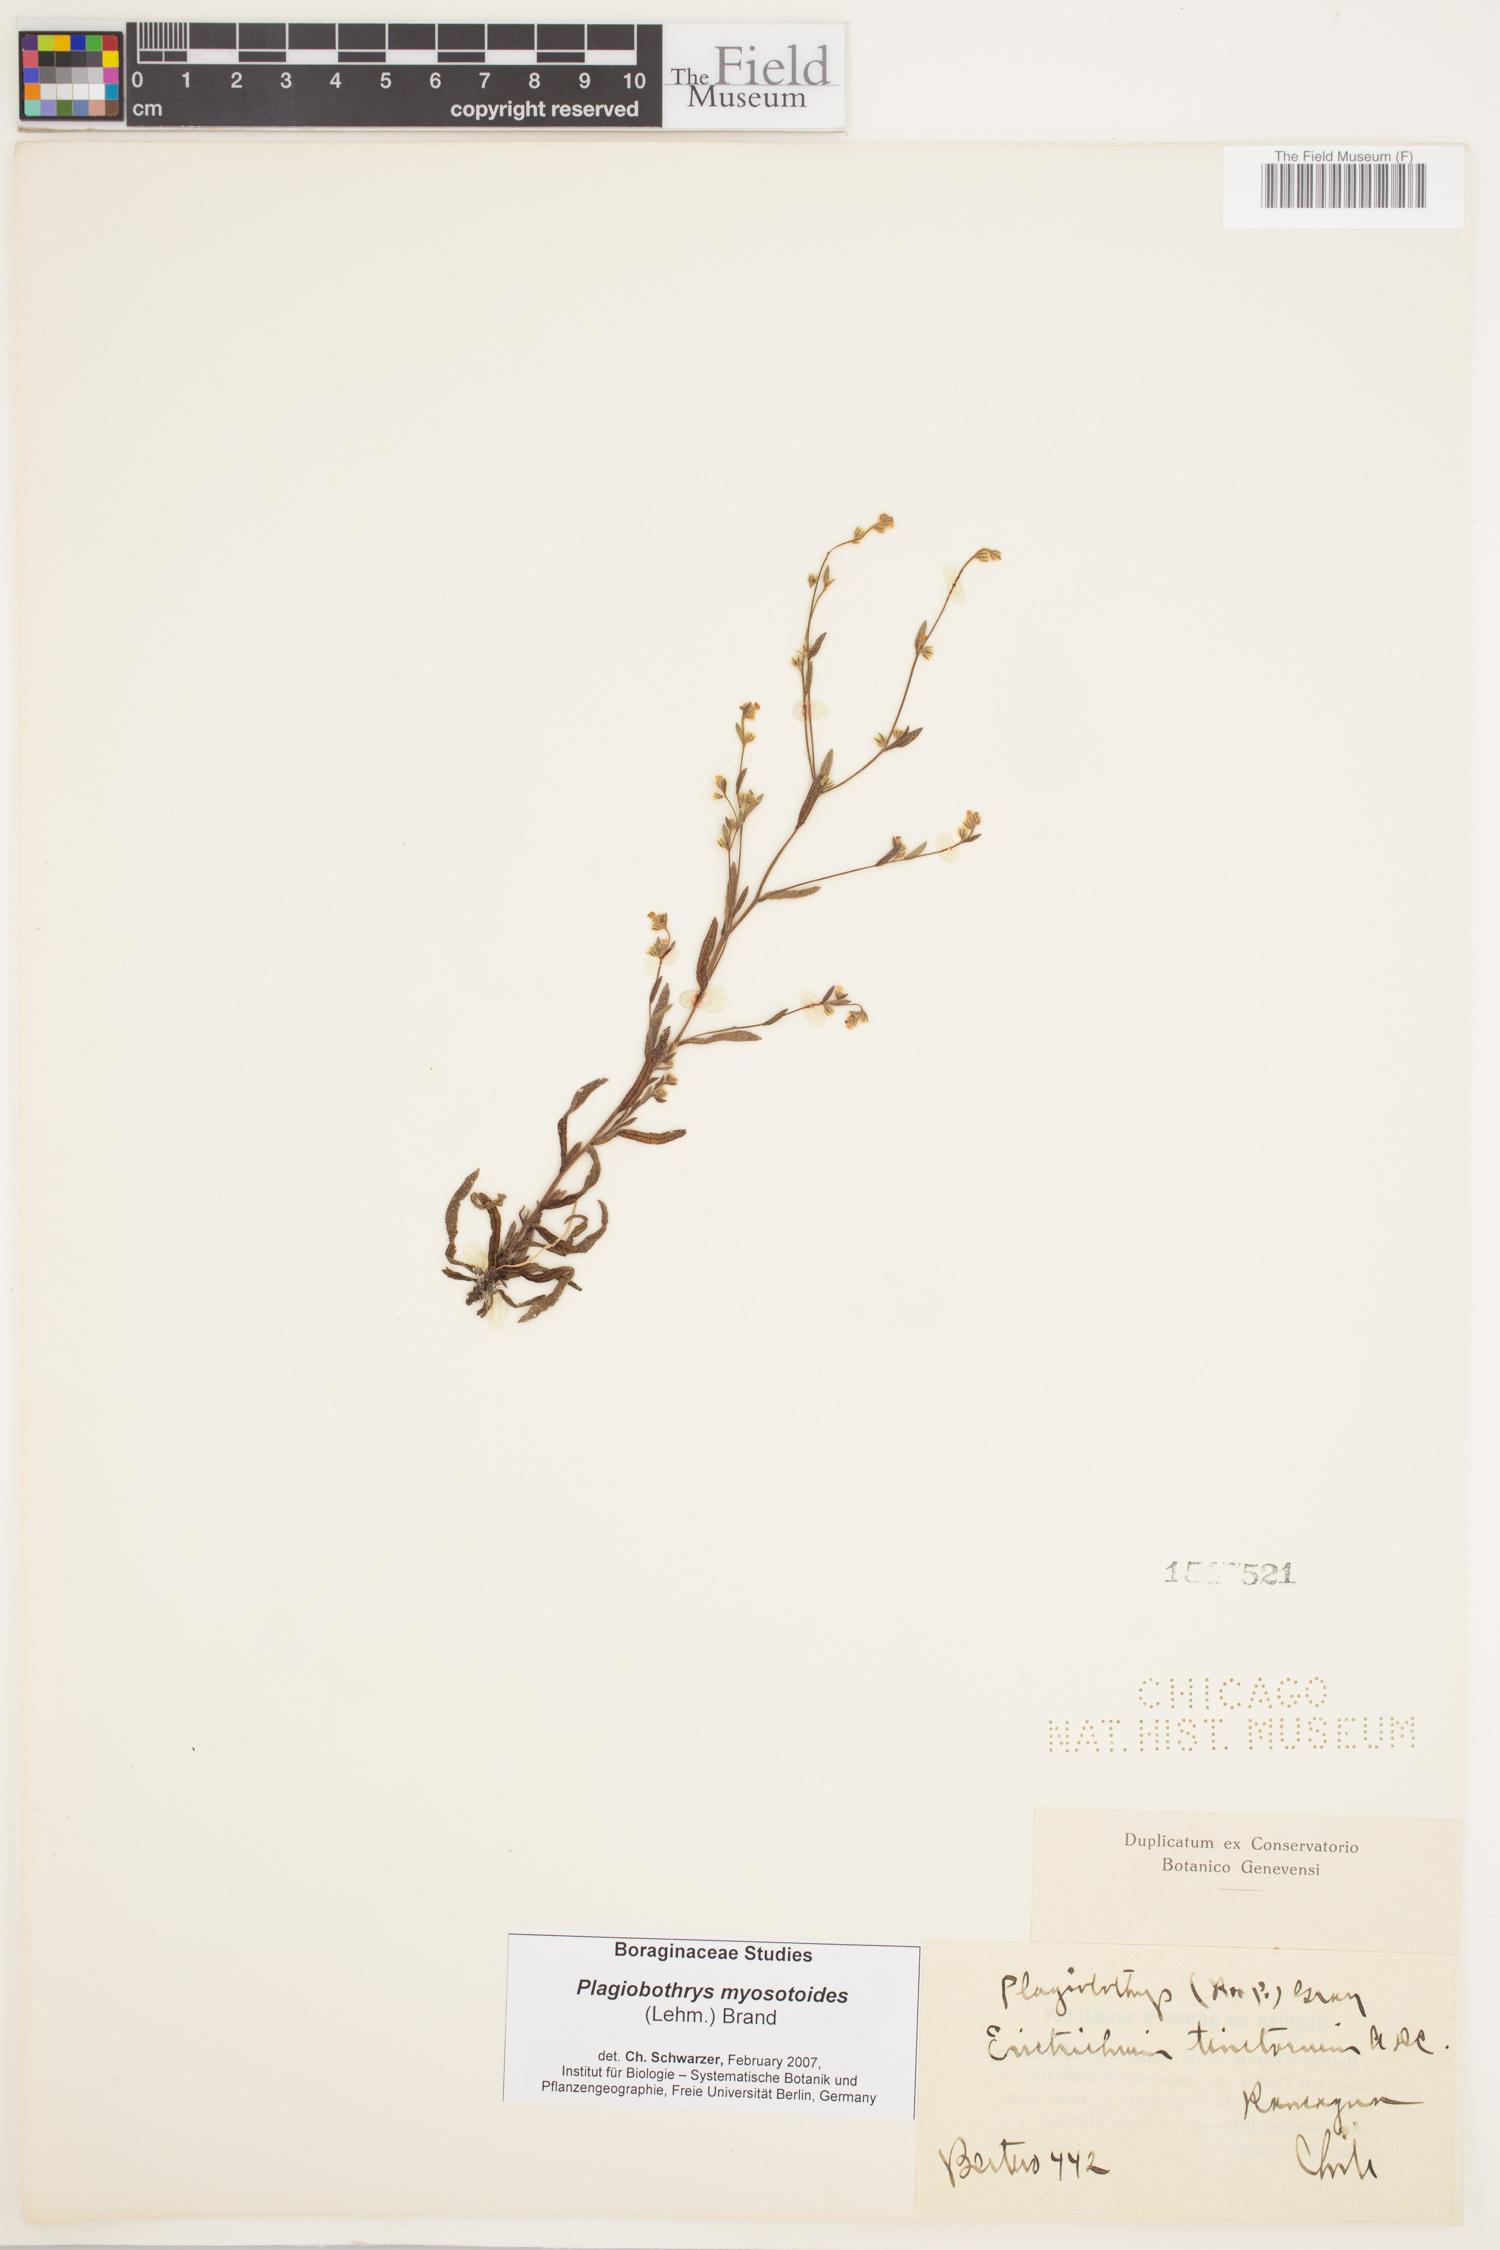 Plagiobothrys myosotoides image